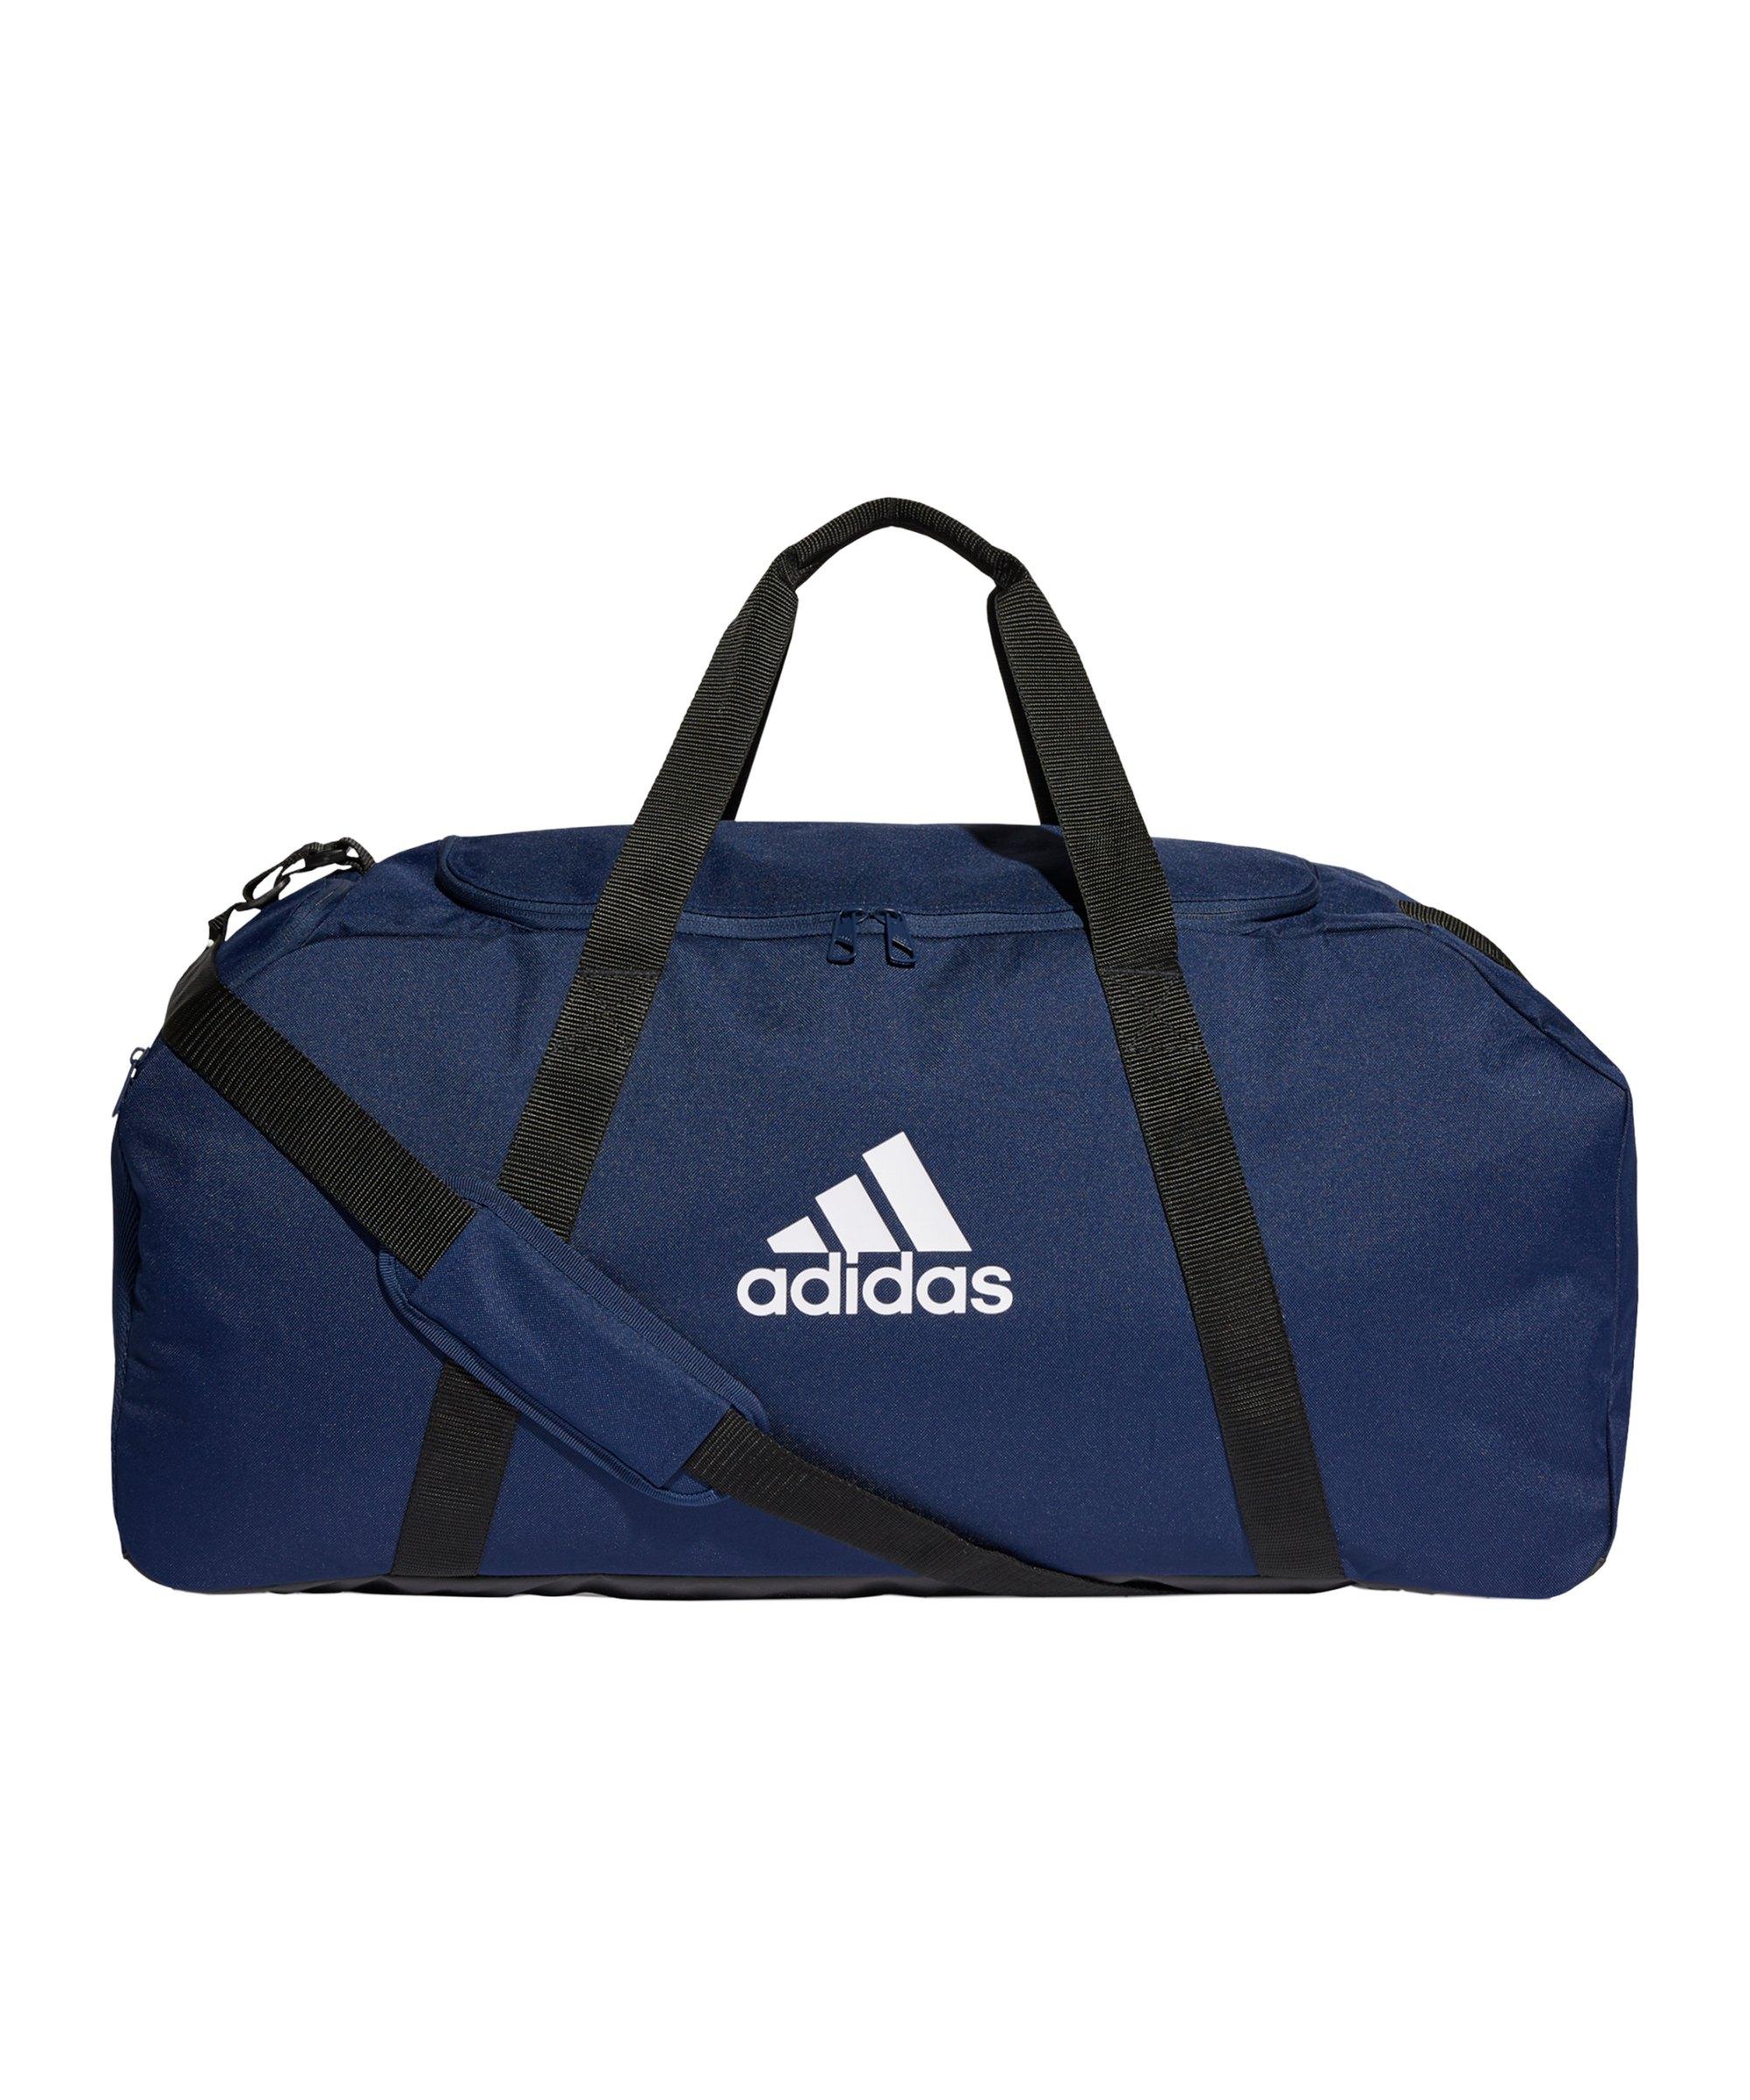 adidas Tiro Duffle Bag Gr. L Blau Weiss - blau